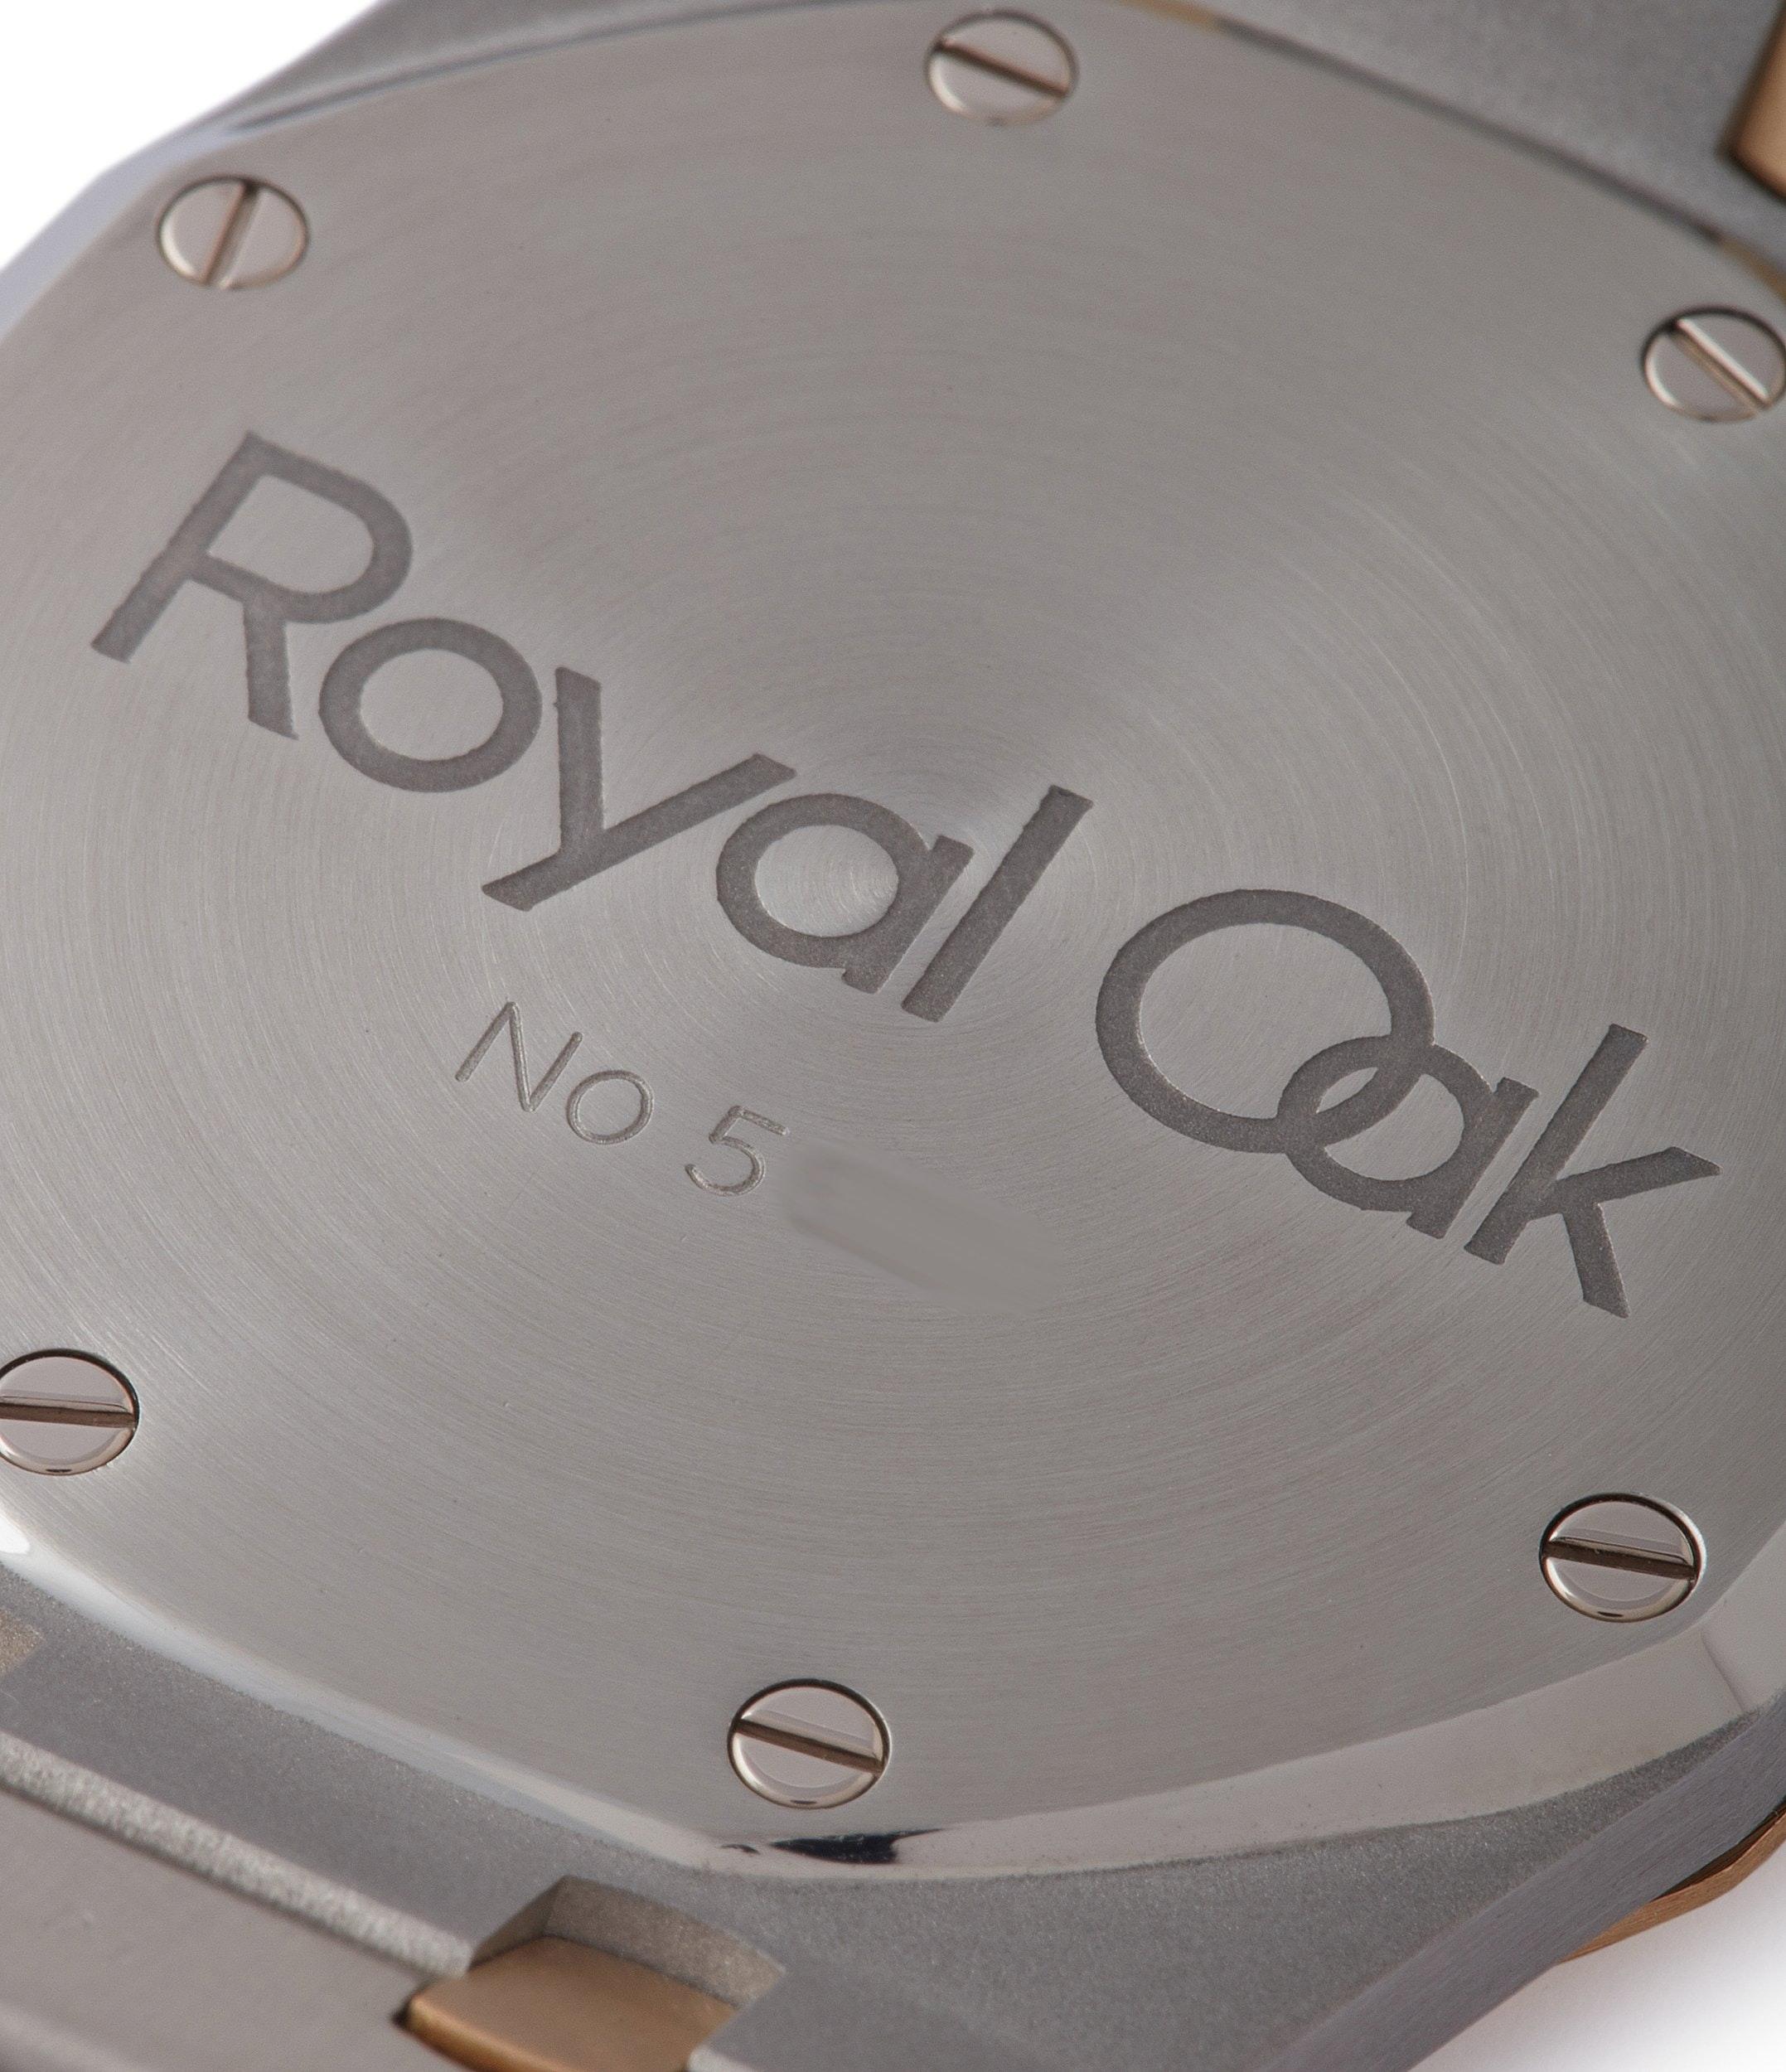 Audemars_Piguet_5402SA_Royal_Oak_steel_y